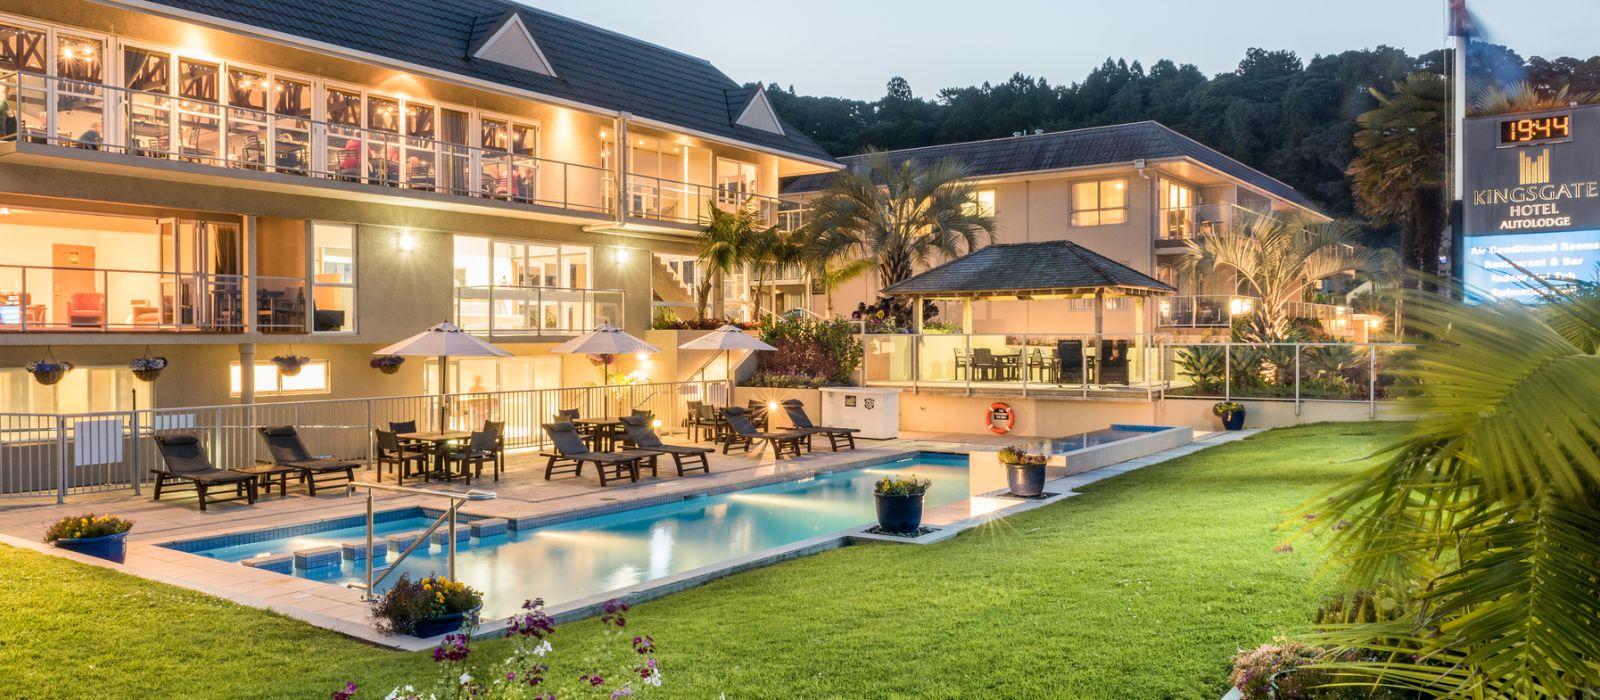 Hotel The Kingsgate  Autolodge Paihia Neuseeland